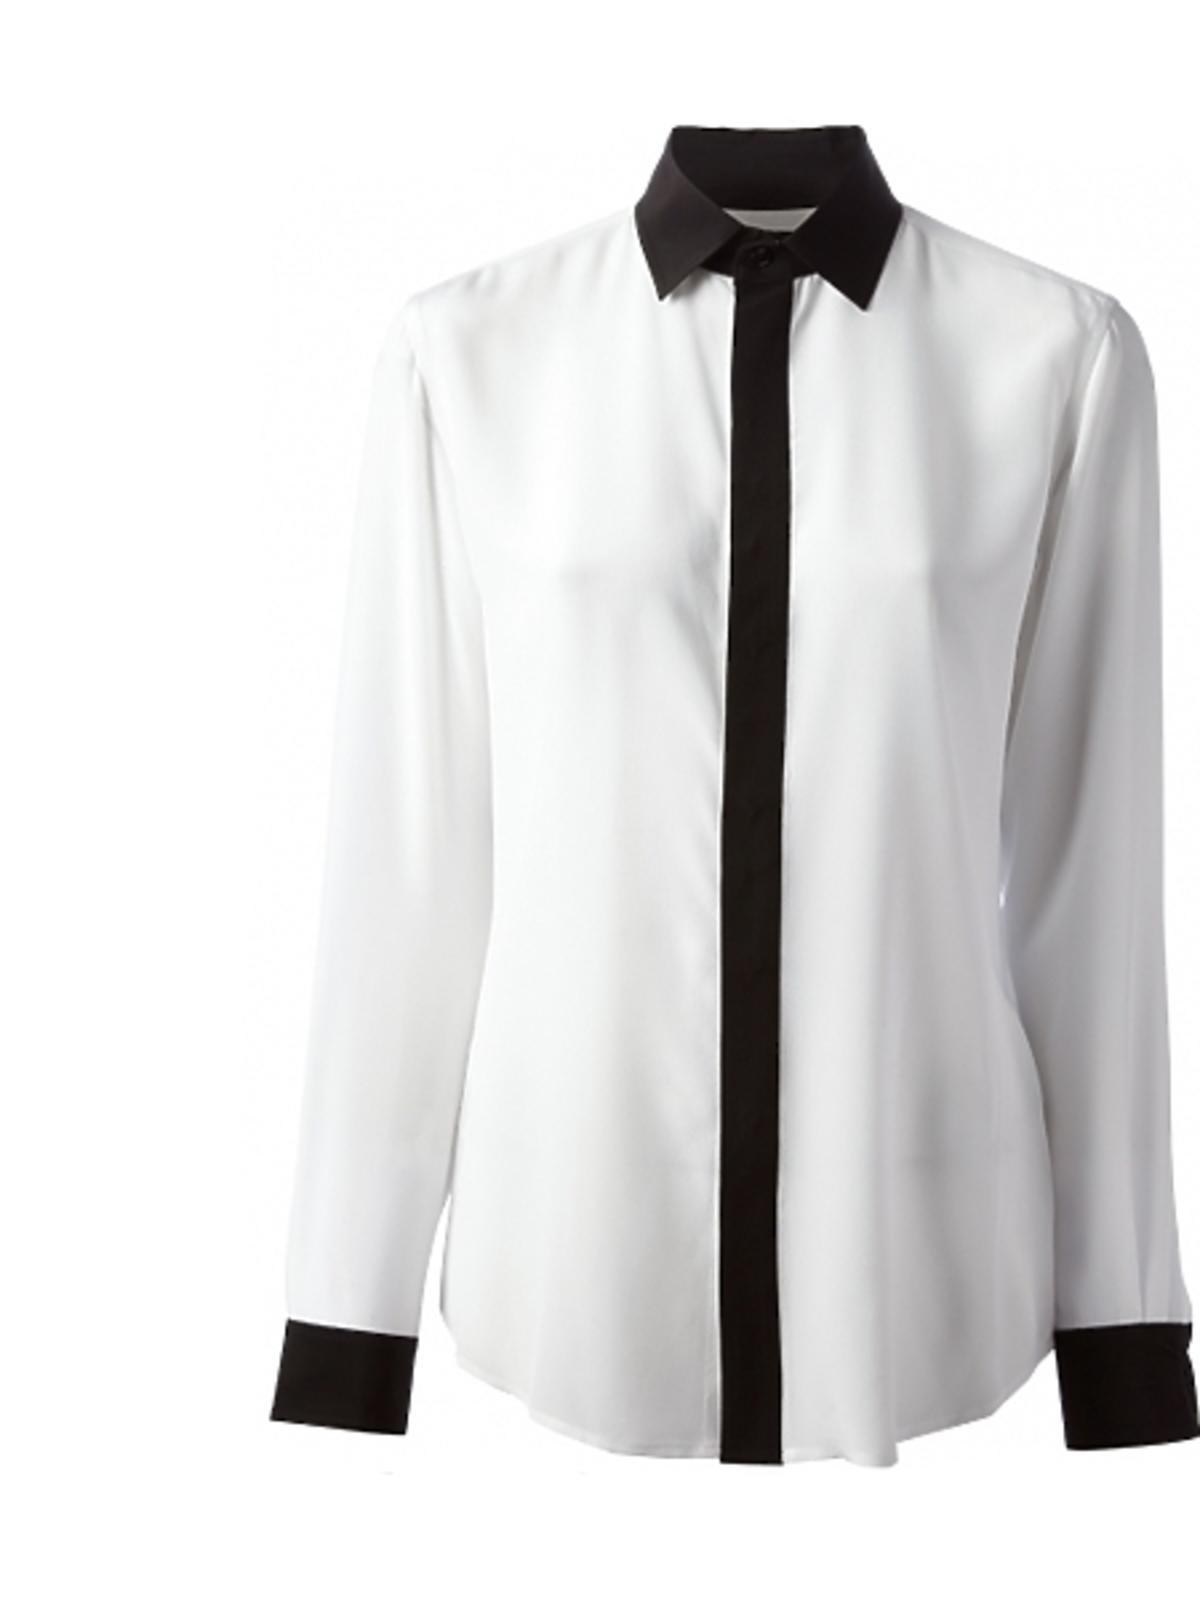 Biała koszula Ralph Lauren, cena